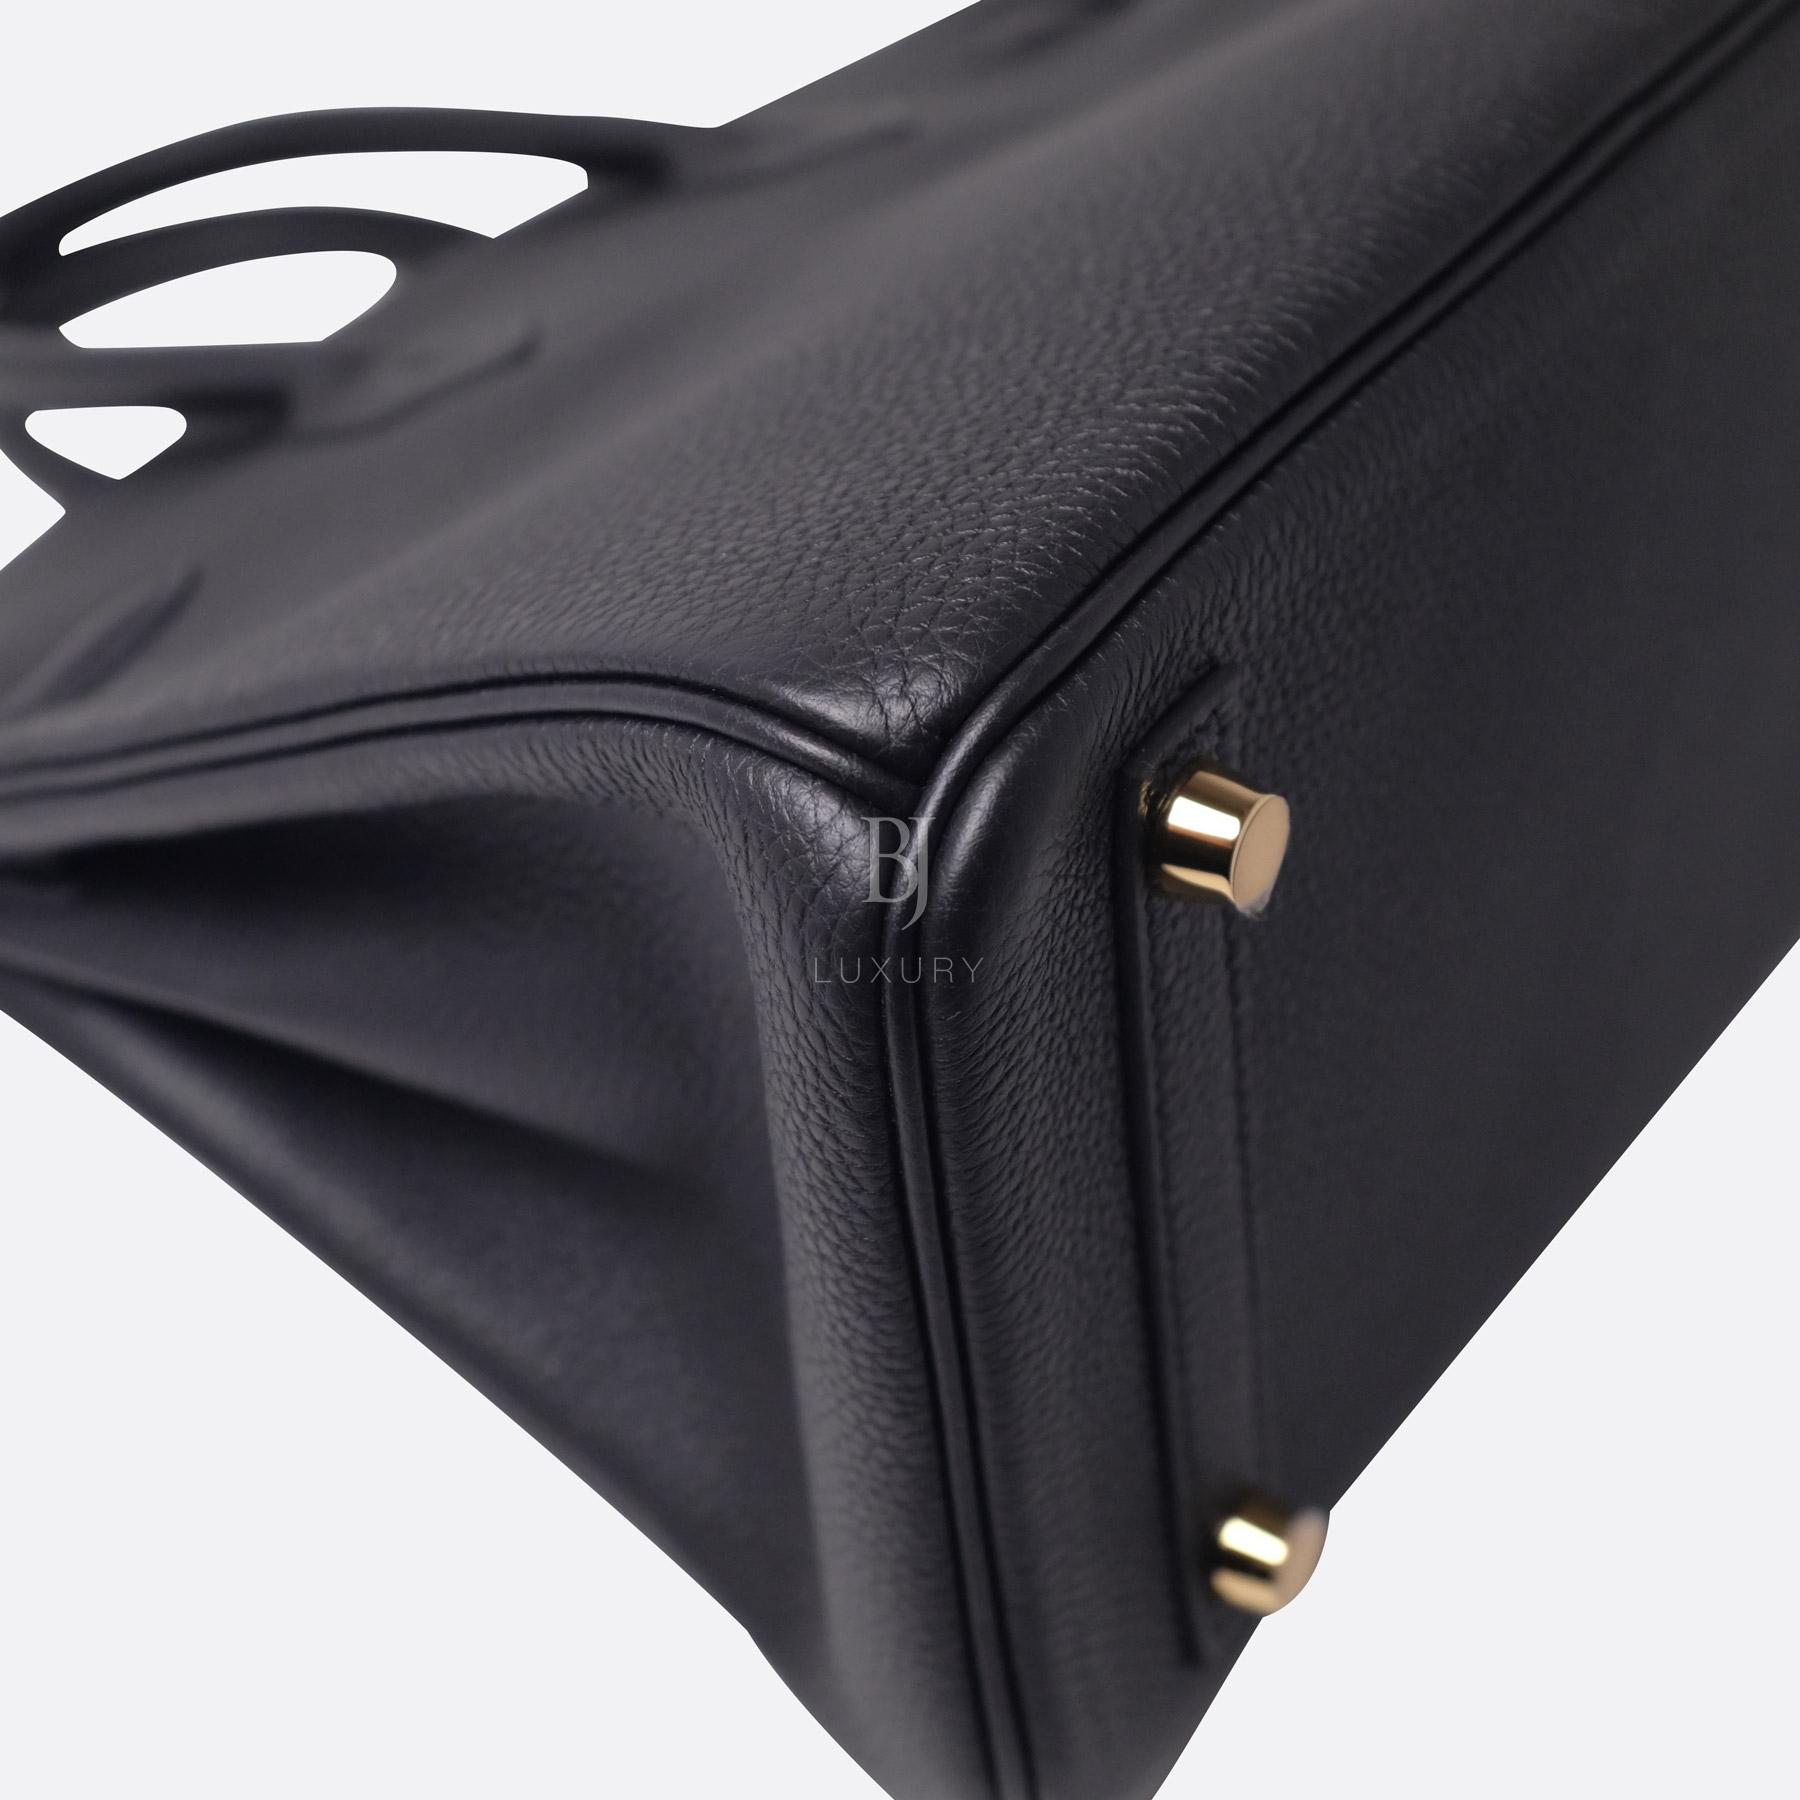 Hermes Birkin 25 Black Togo Gold Hardware BJ Luxury 13.jpg